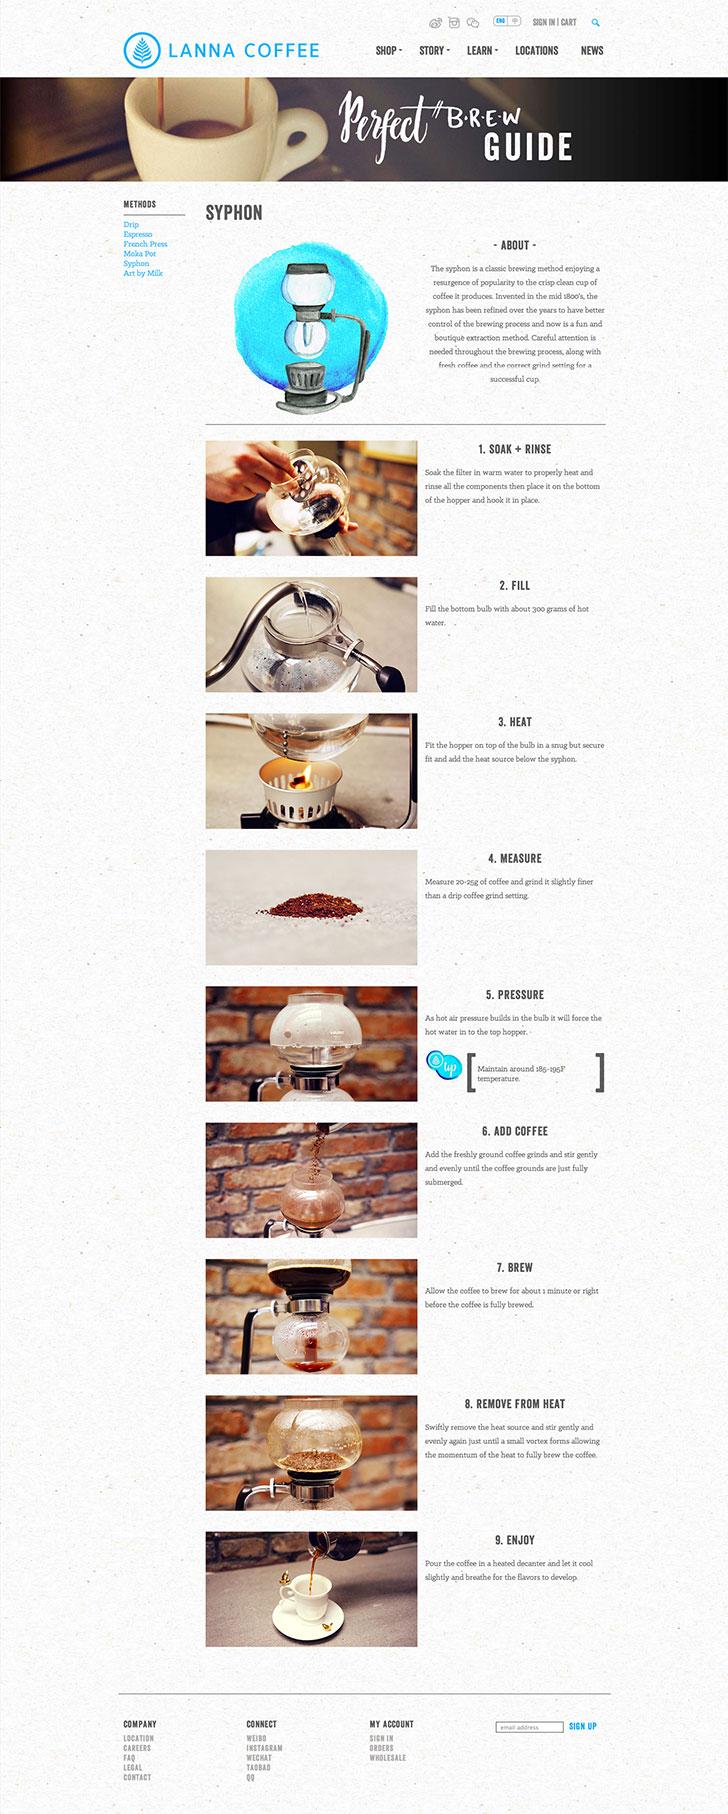 Public Marking Lanna Coffee Website Methods